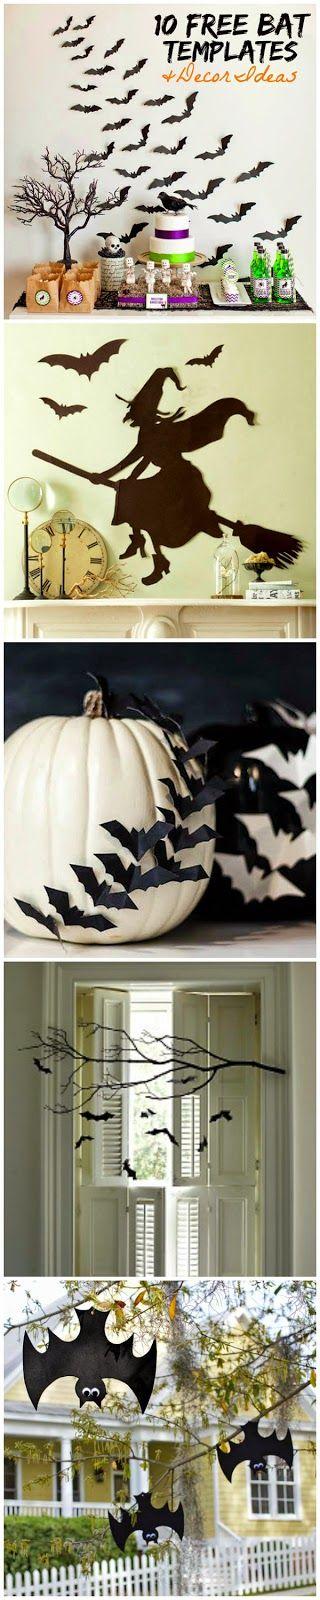 10 Free Printable Bat Templates and Halloween Decor Ideas! Love these.